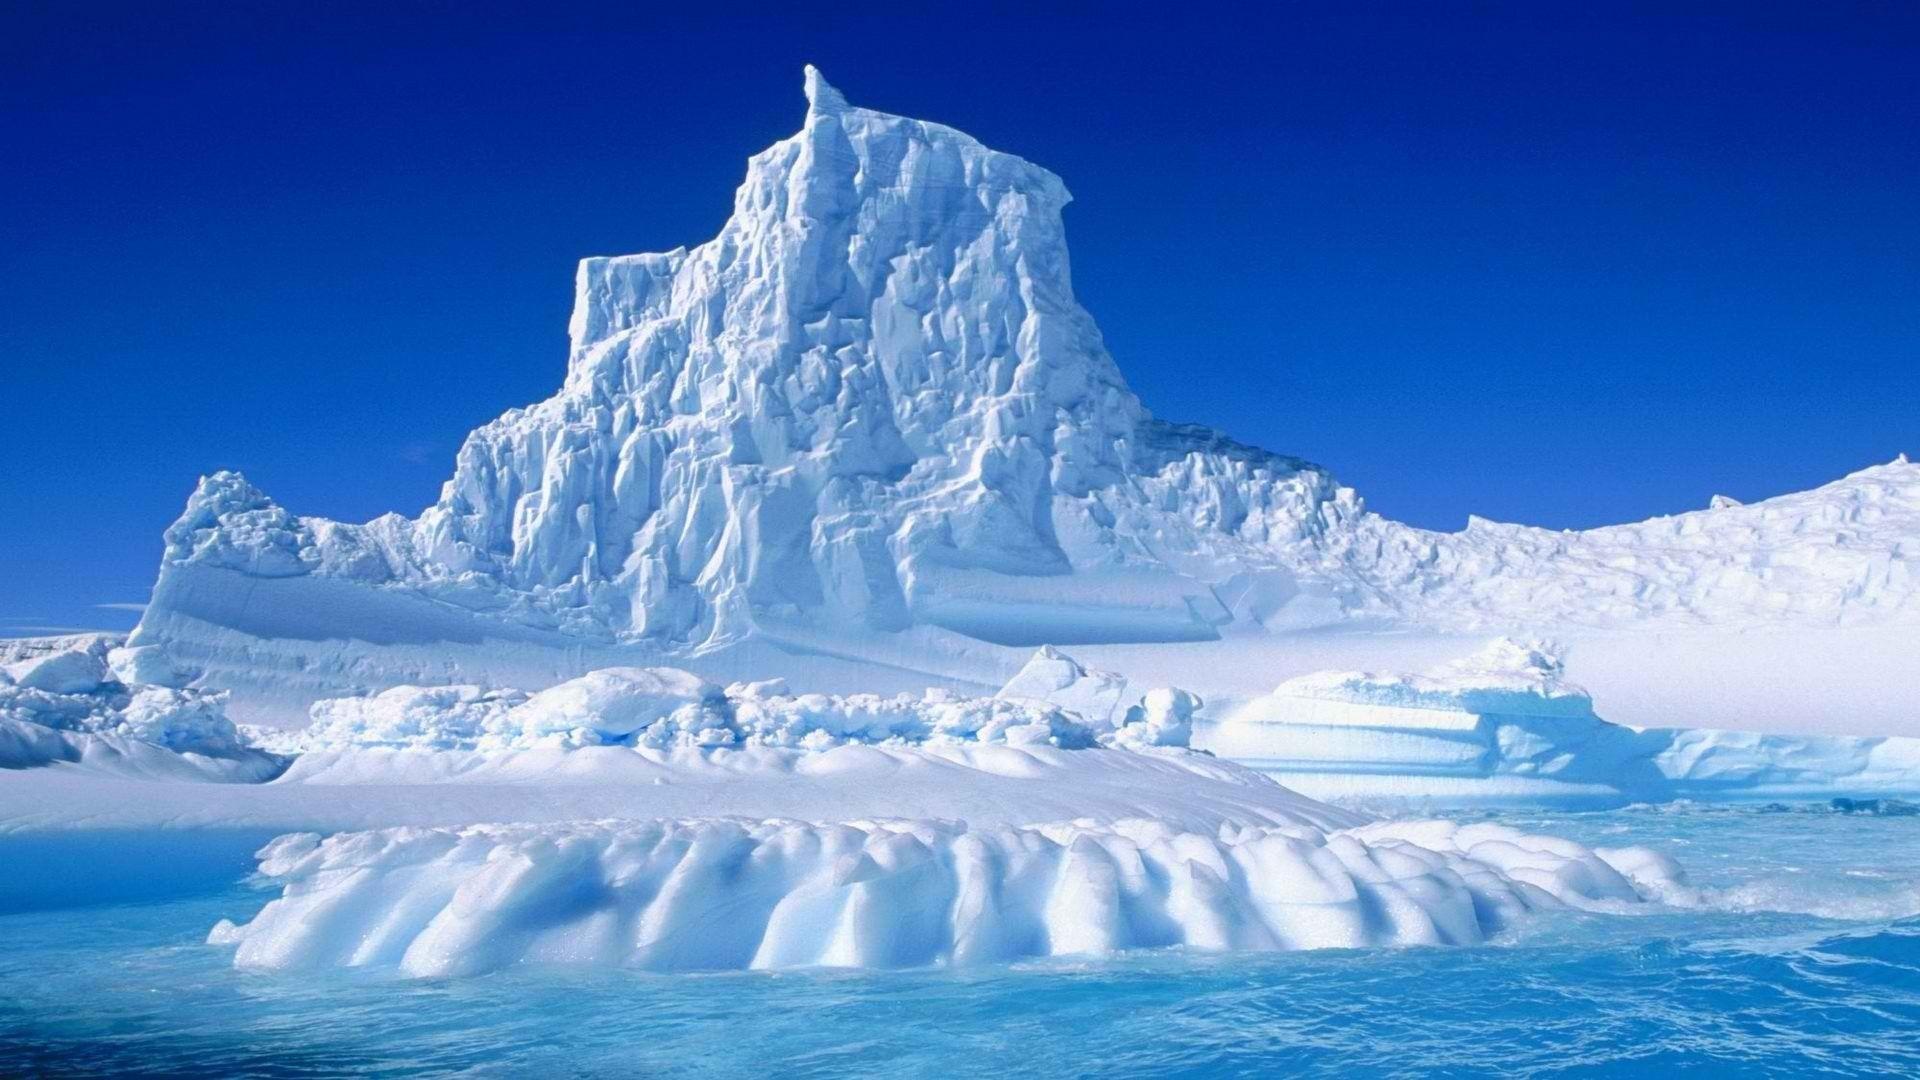 Днем рождения, антарктида картинки